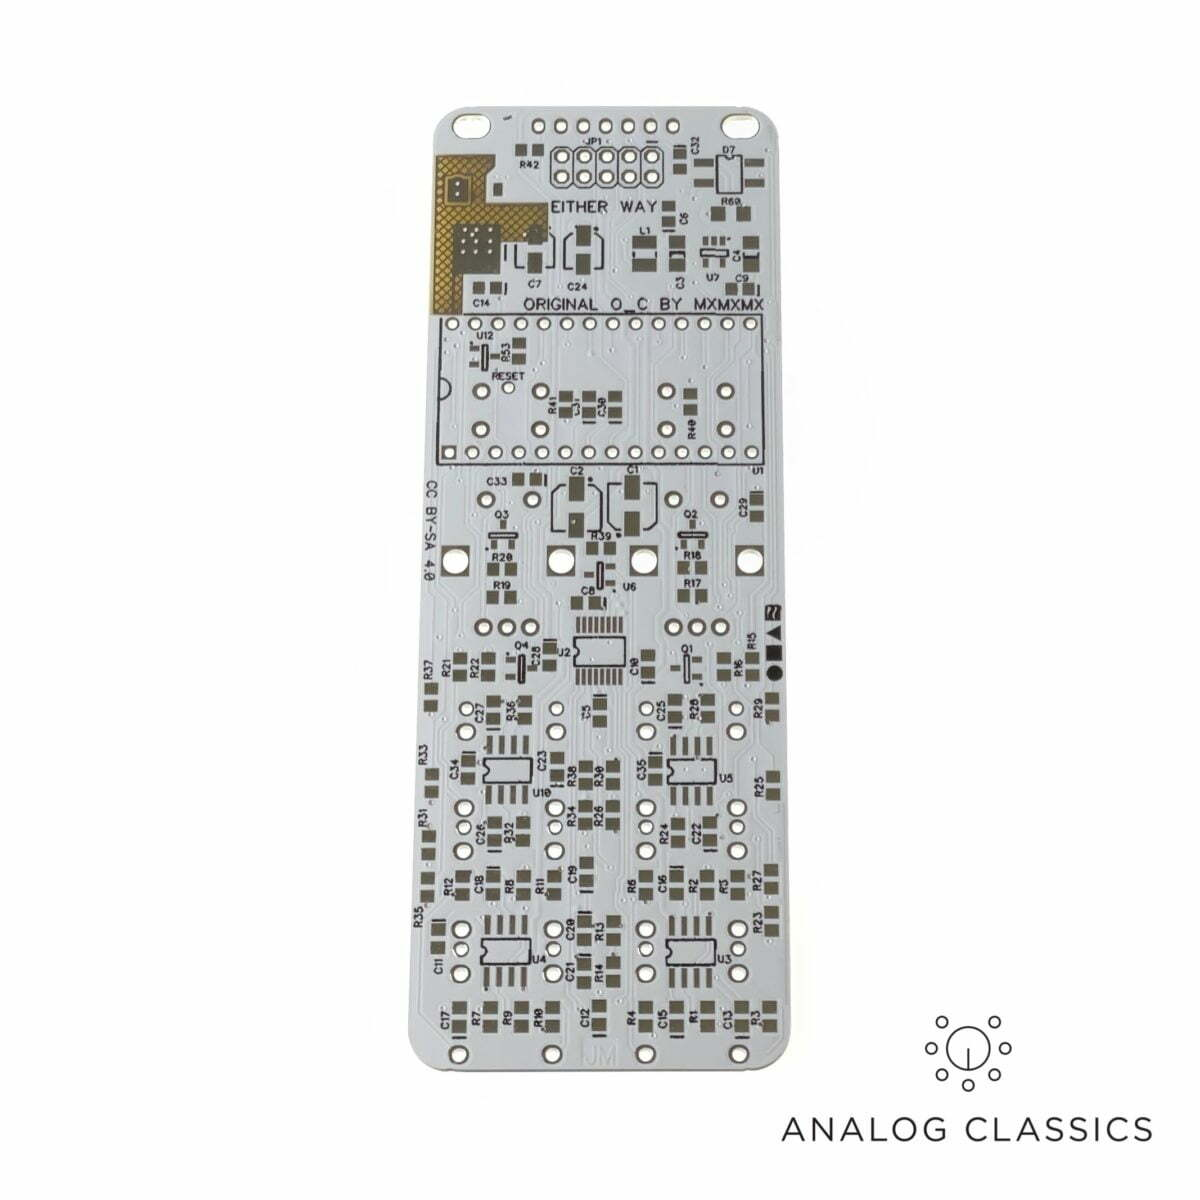 uO_C Micro Ornament and Crime PCB v1.1 at Analog Classics